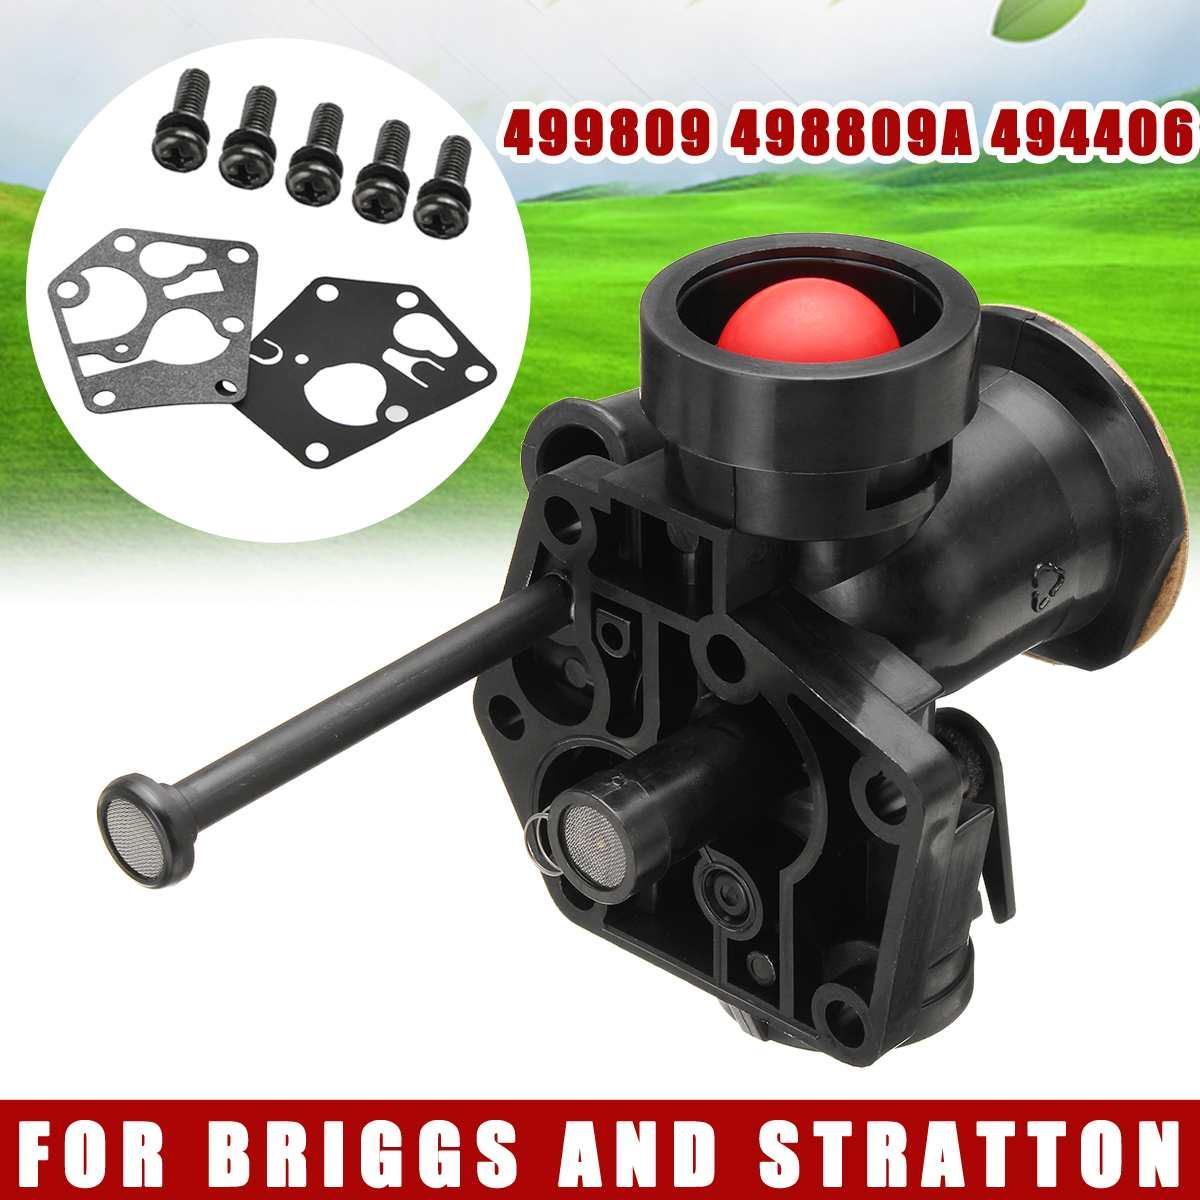 High Quality Grass Trimmer Carburetor Carb Assembly For Briggs And Stratton 499809 498809A 494406